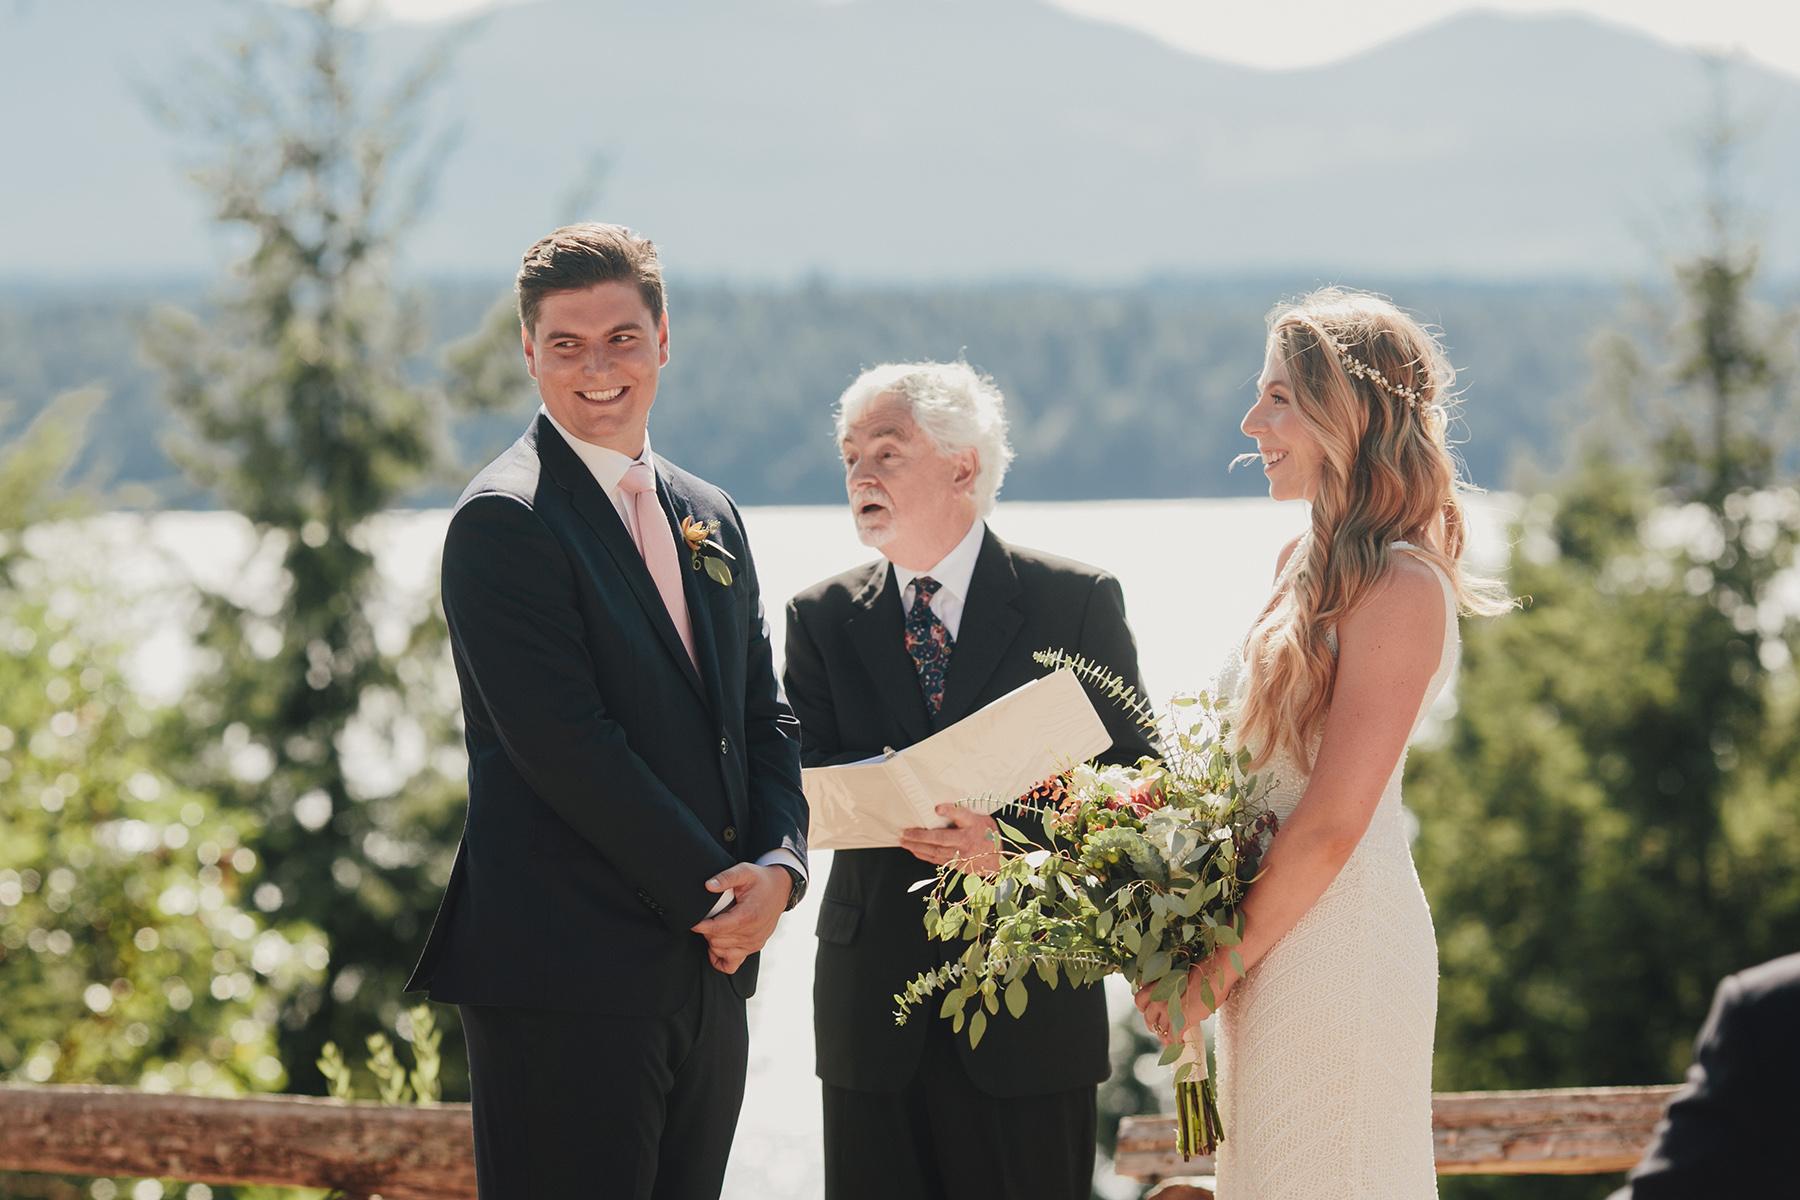 galiano-island-bodega-destination-wedding-0054.JPG